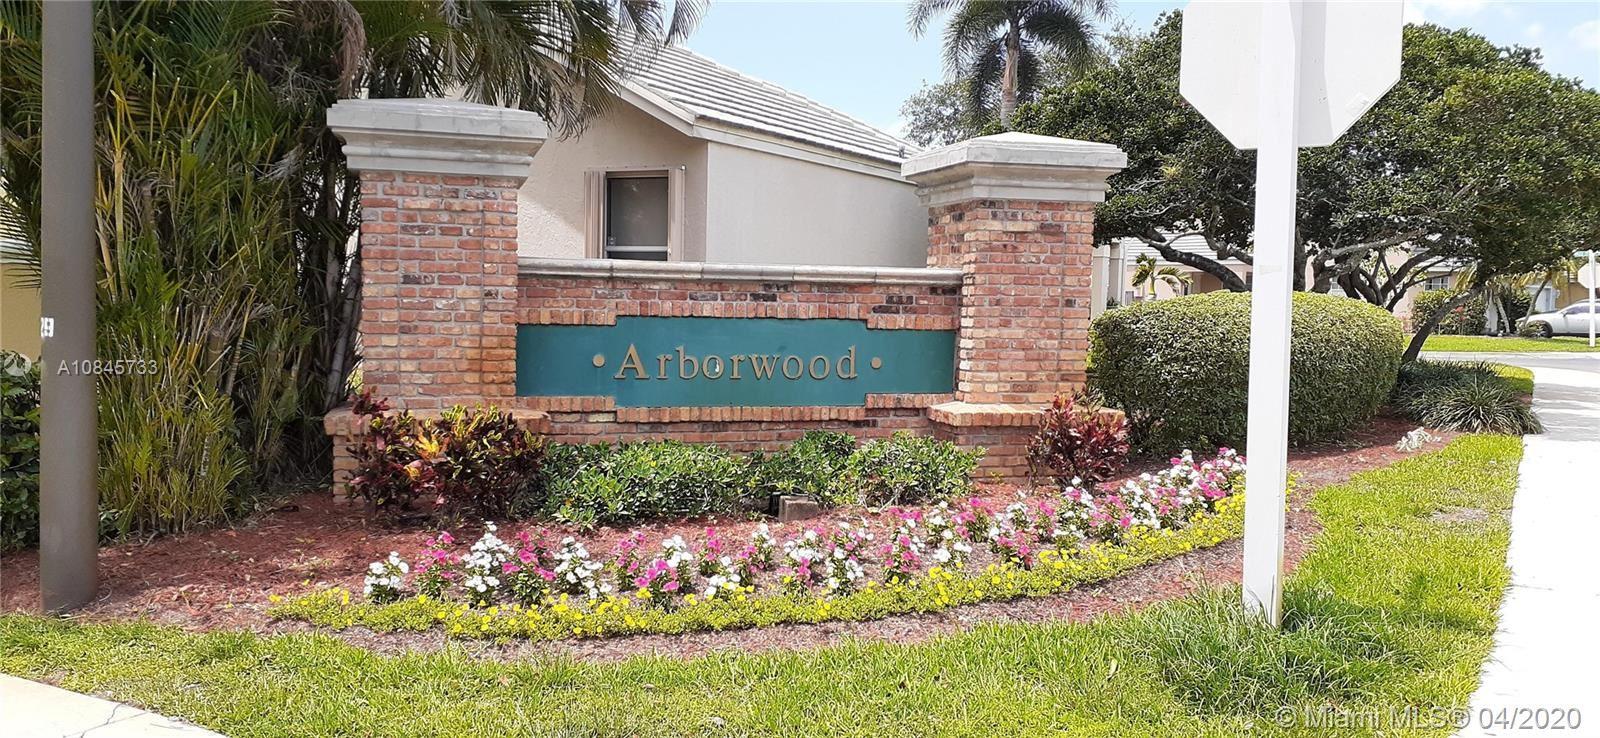 9219 Arborwood Cir, Davie, FL 33328 - #: A10845733